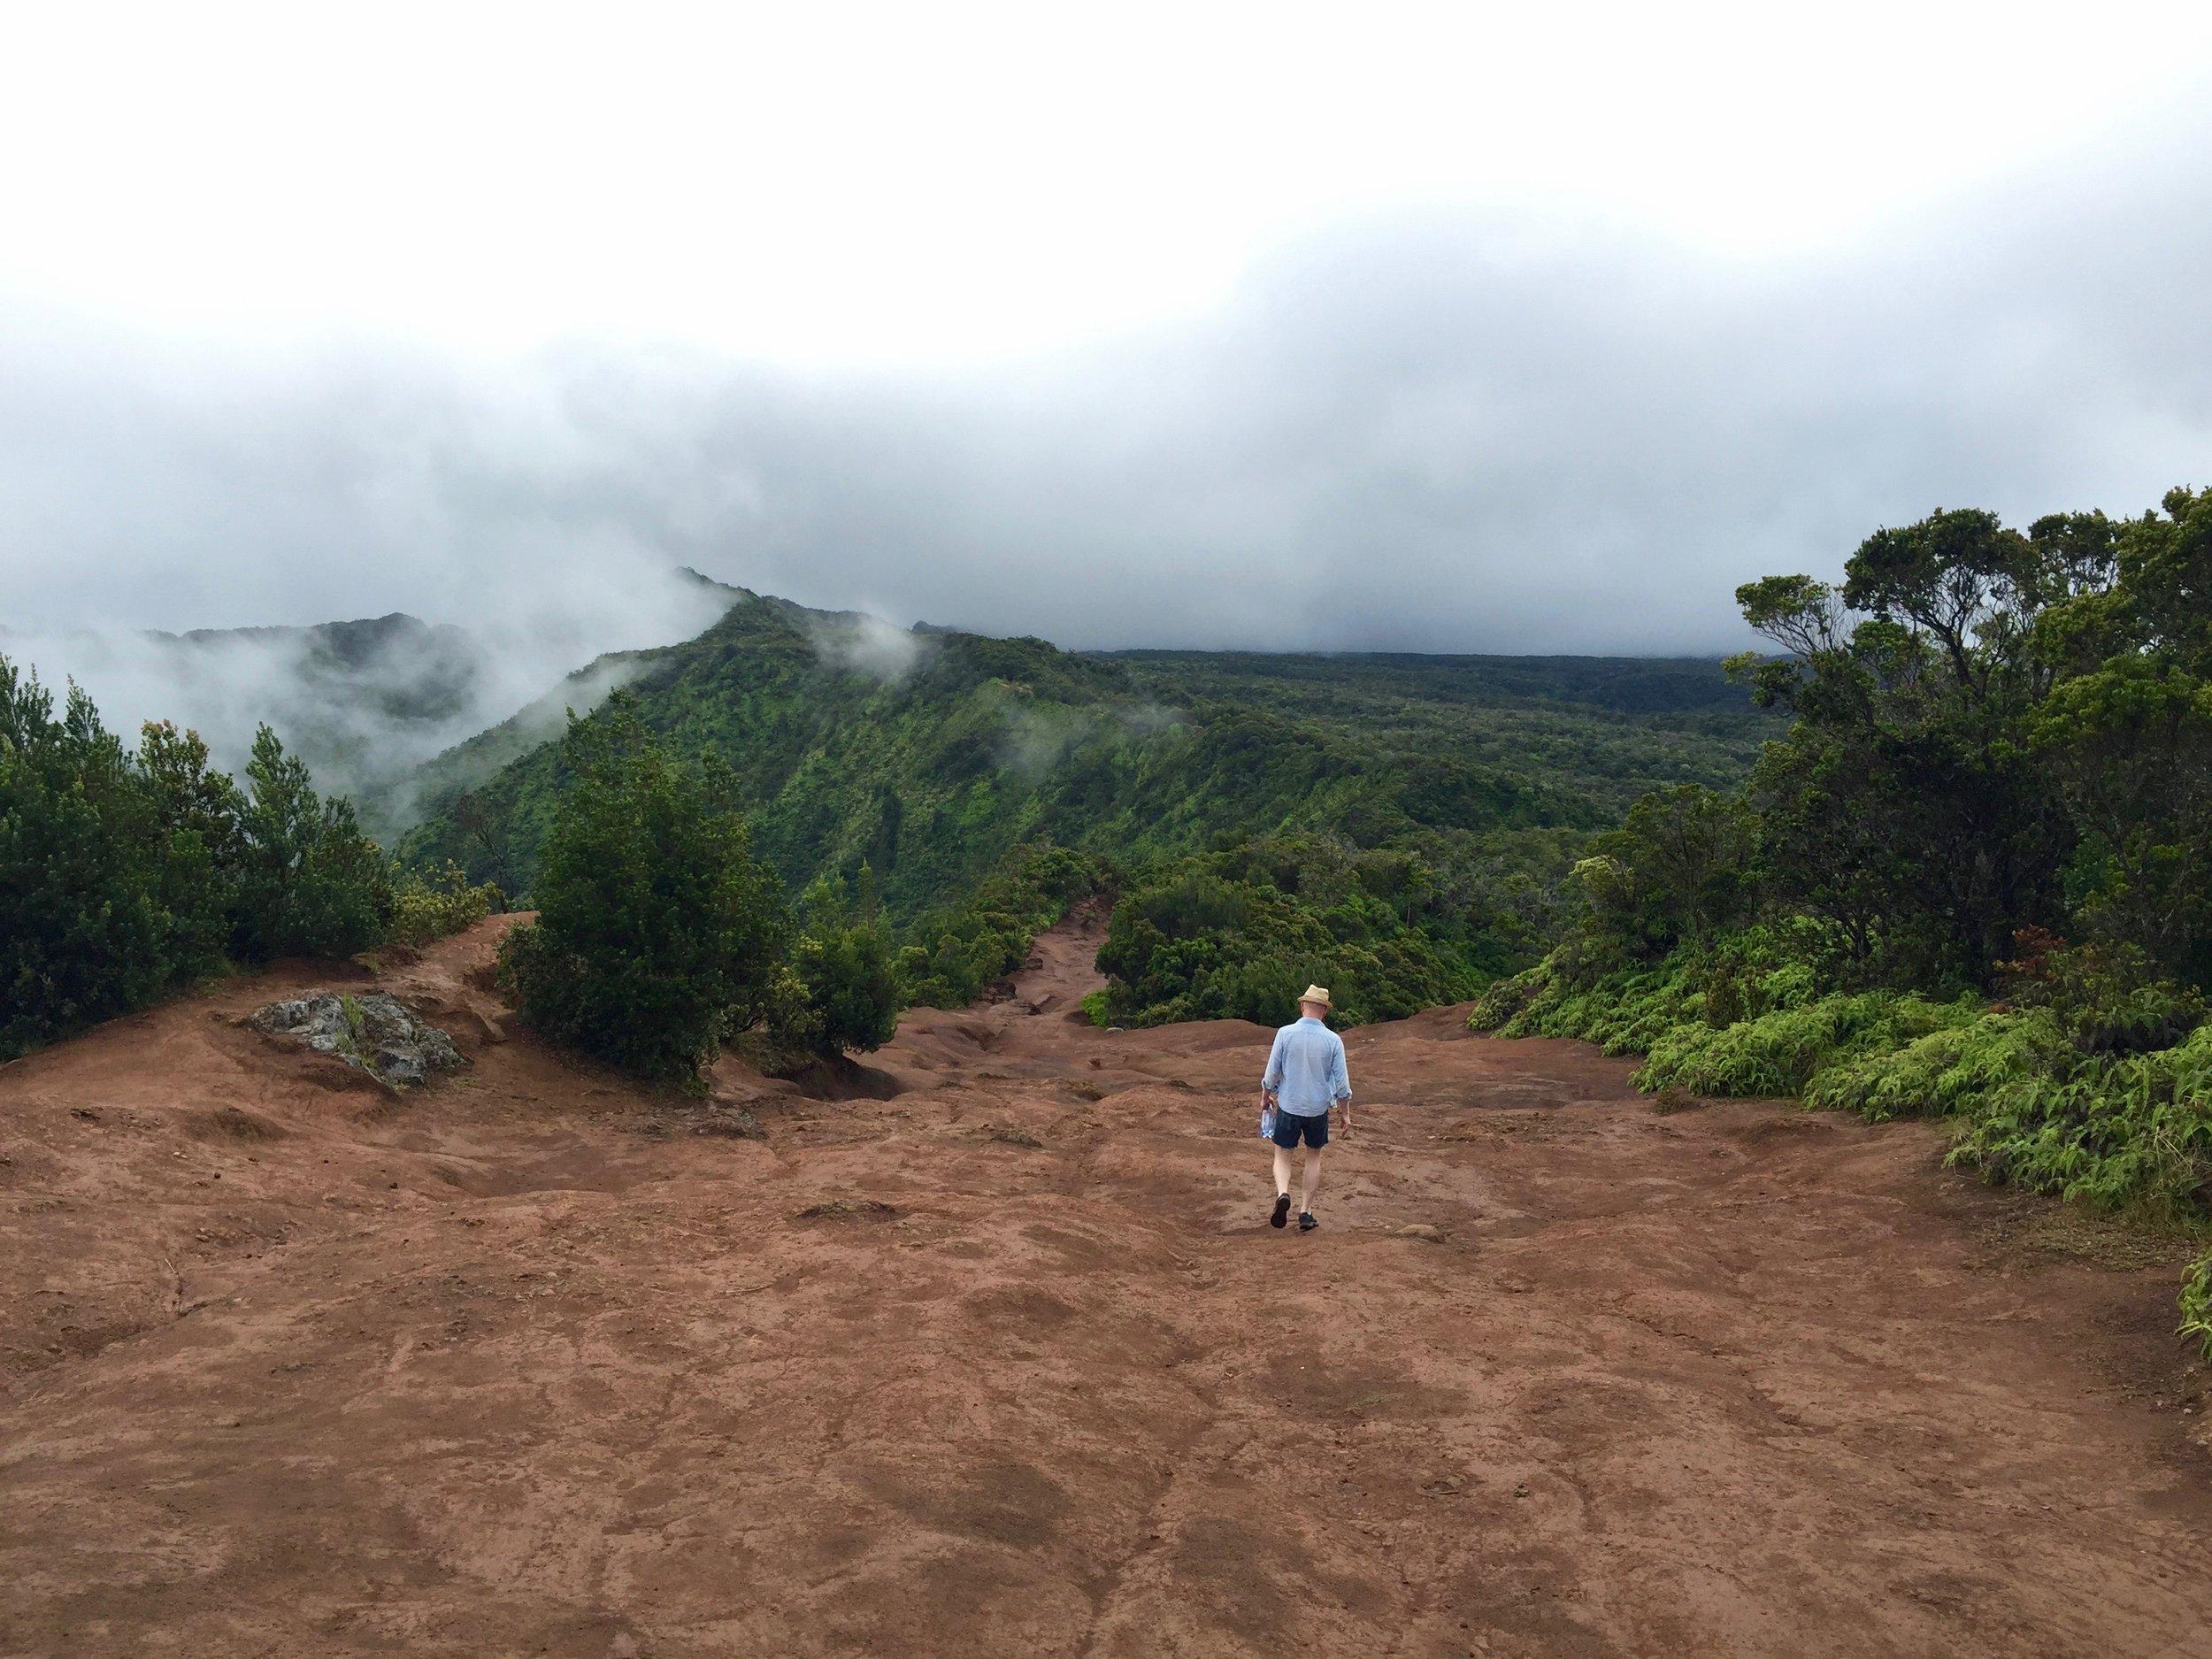 Hiking along the rim of the Kalalau Valley.